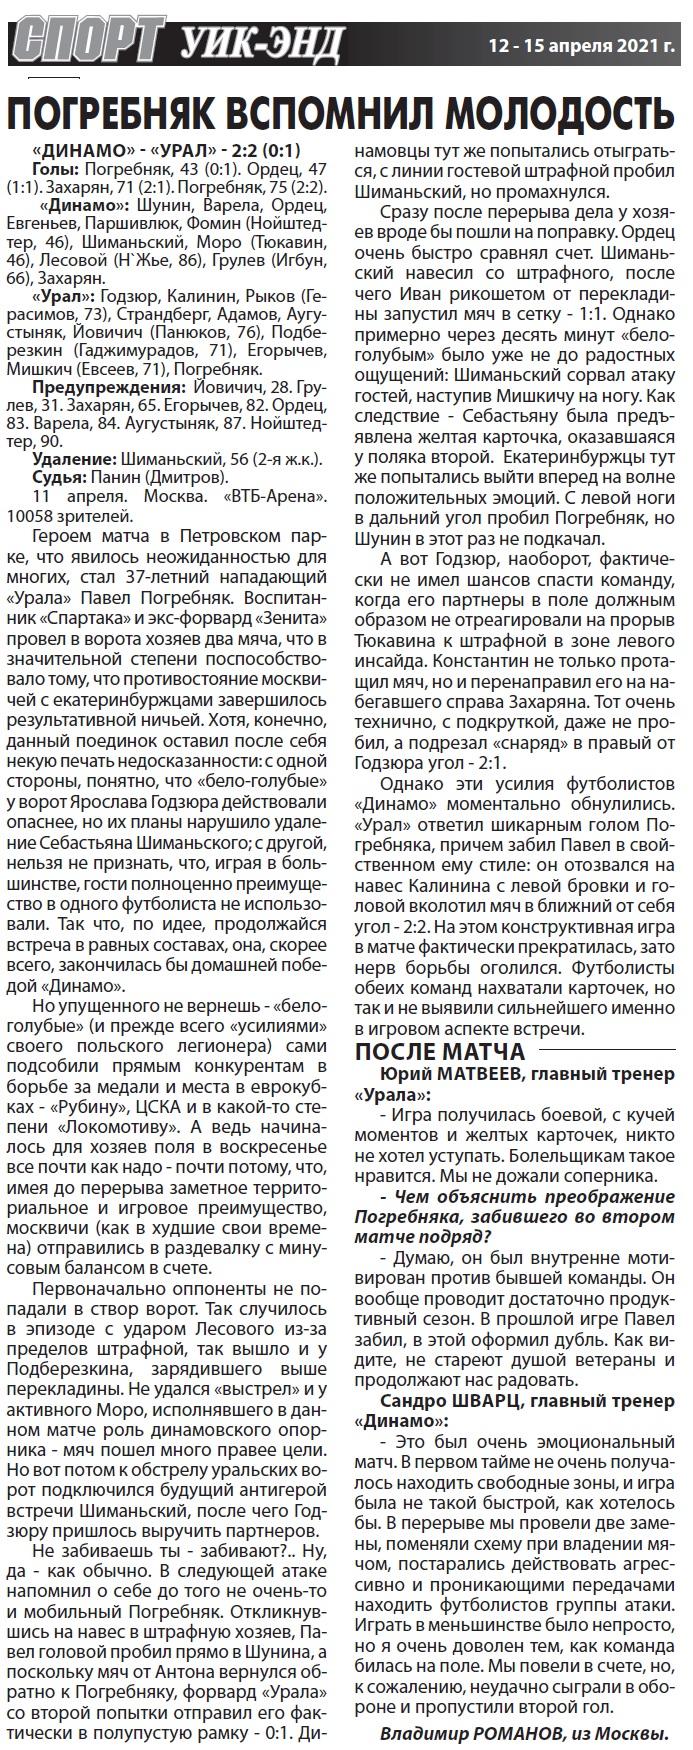 Динамо (Москва) - Урал (Екатеринбург) 2:2